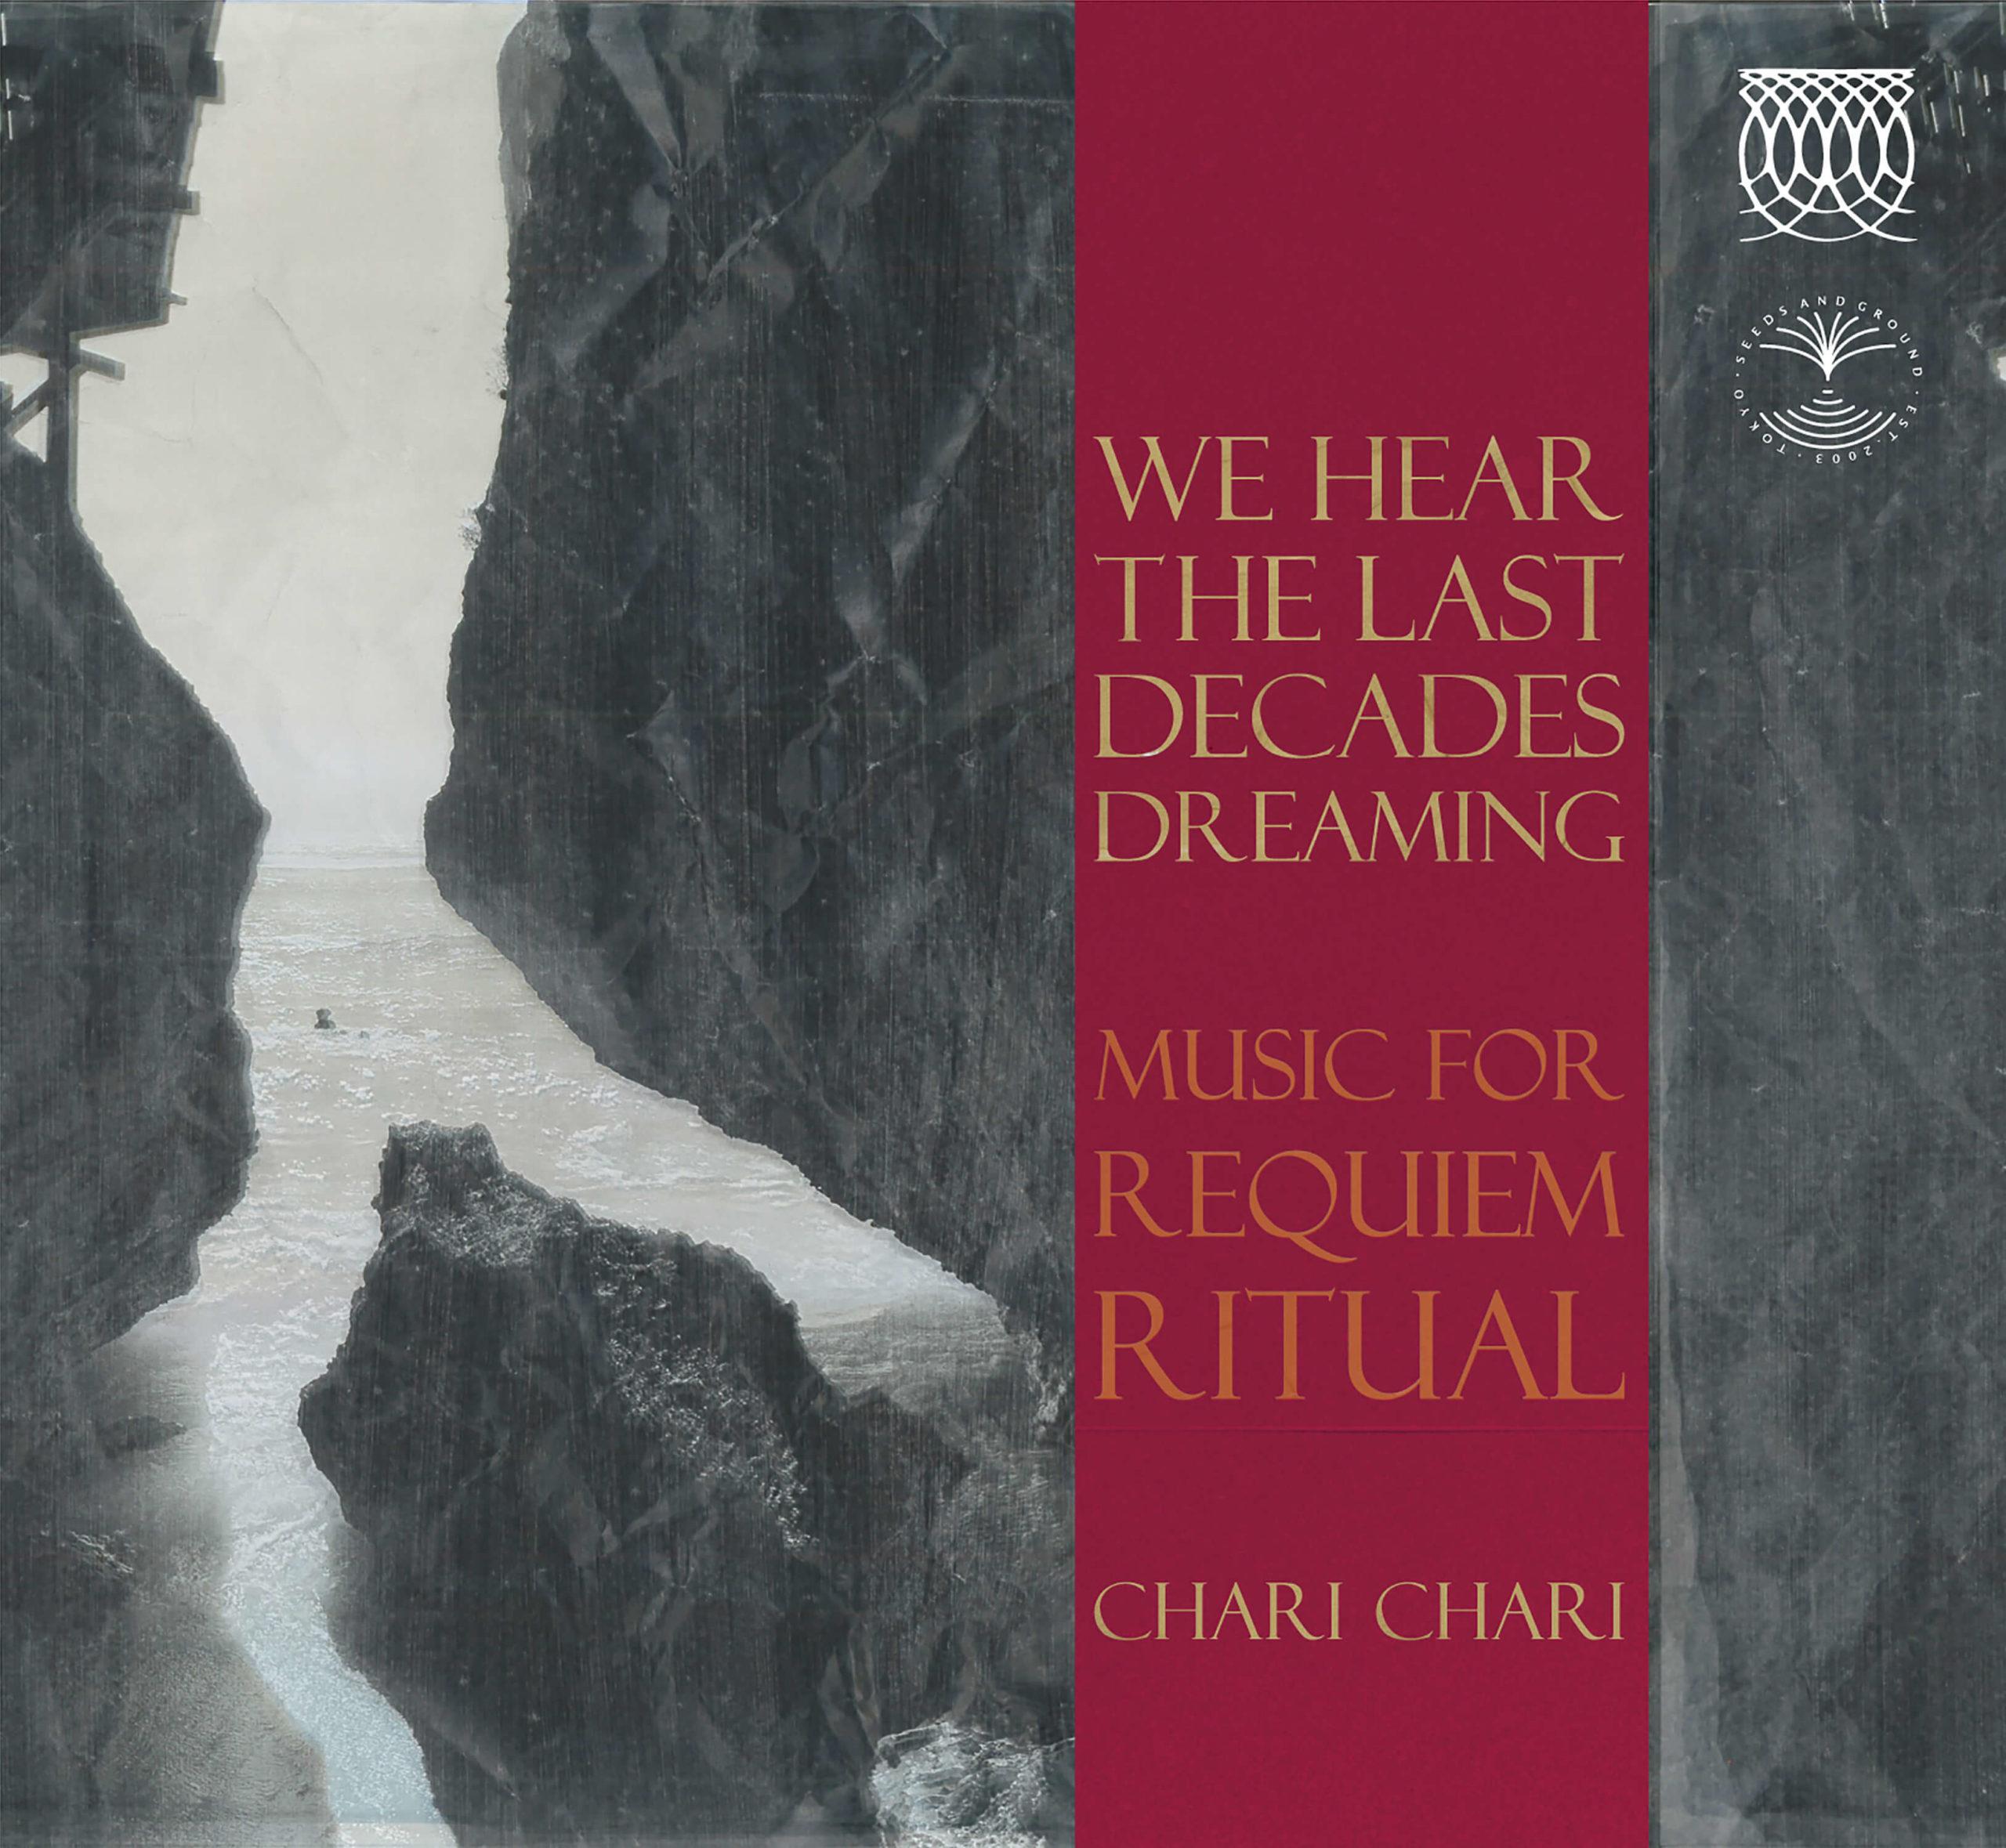 Chari Chari 『We hear the last decades dreaming』